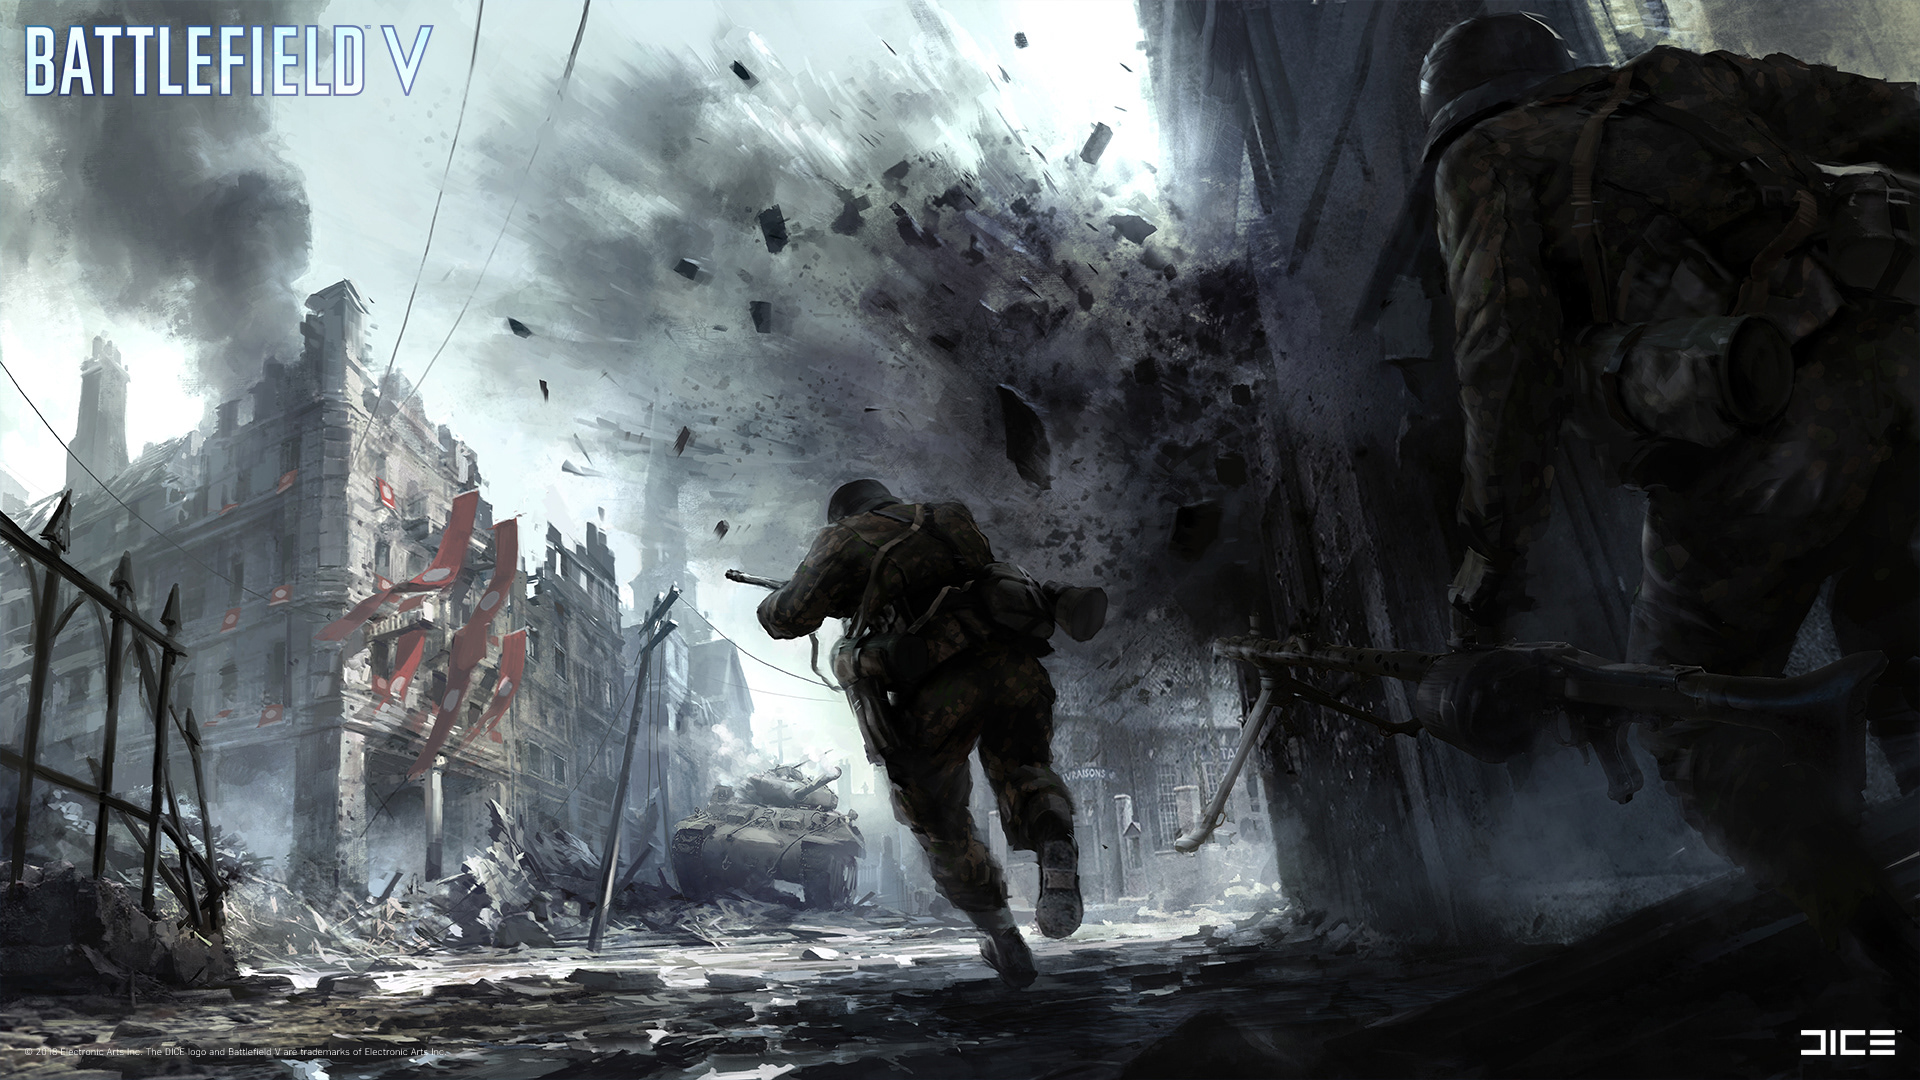 Overview for salaminl - Battlefield v concept art wallpaper ...